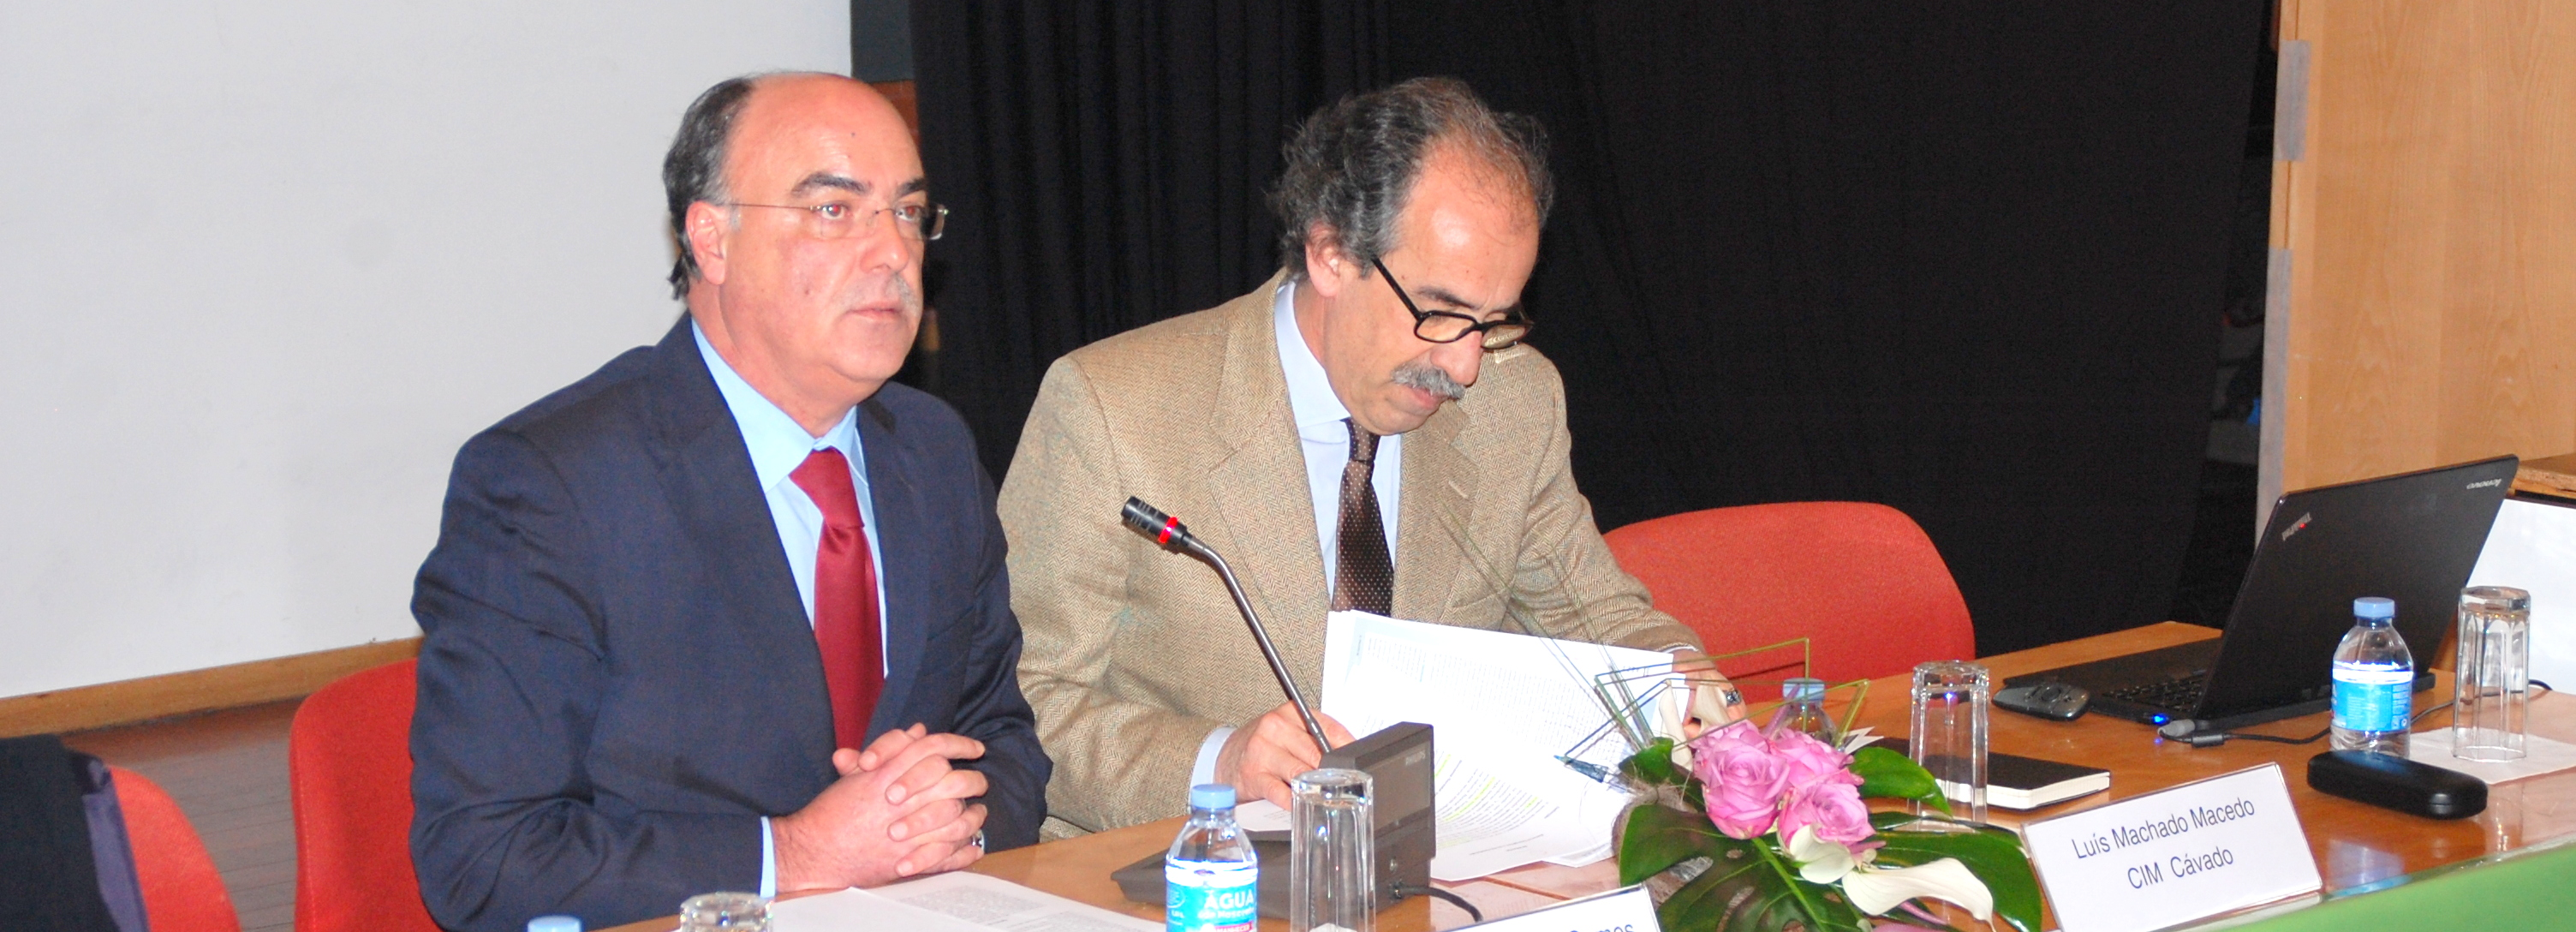 Biomassa em debate na Biblioteca Municipal de Barcelos